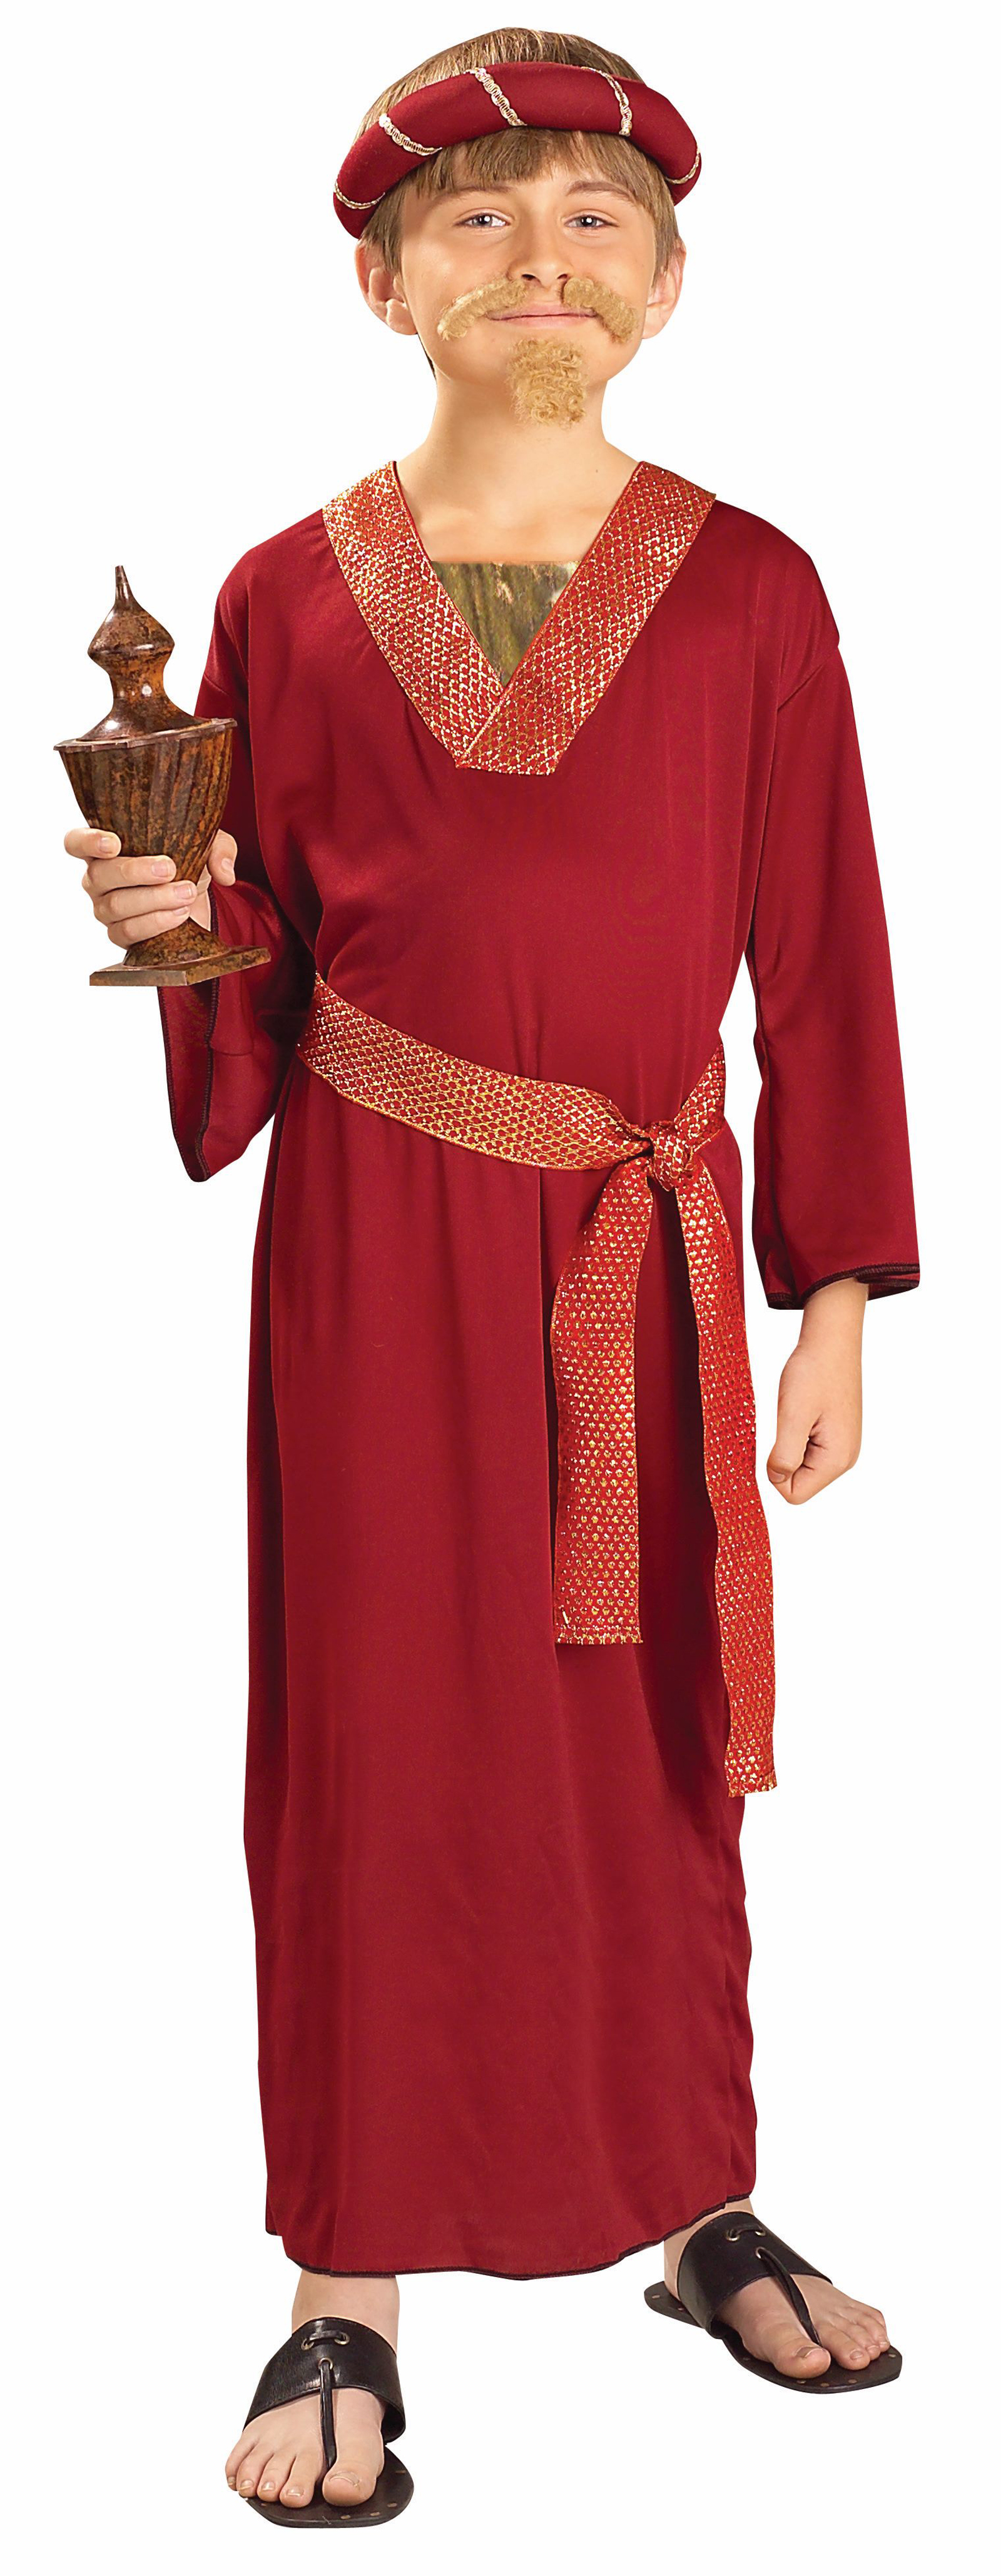 Details about Childrens Boys Burgundy Wiseman Nativity Christian Christmas  Dress Up Costume